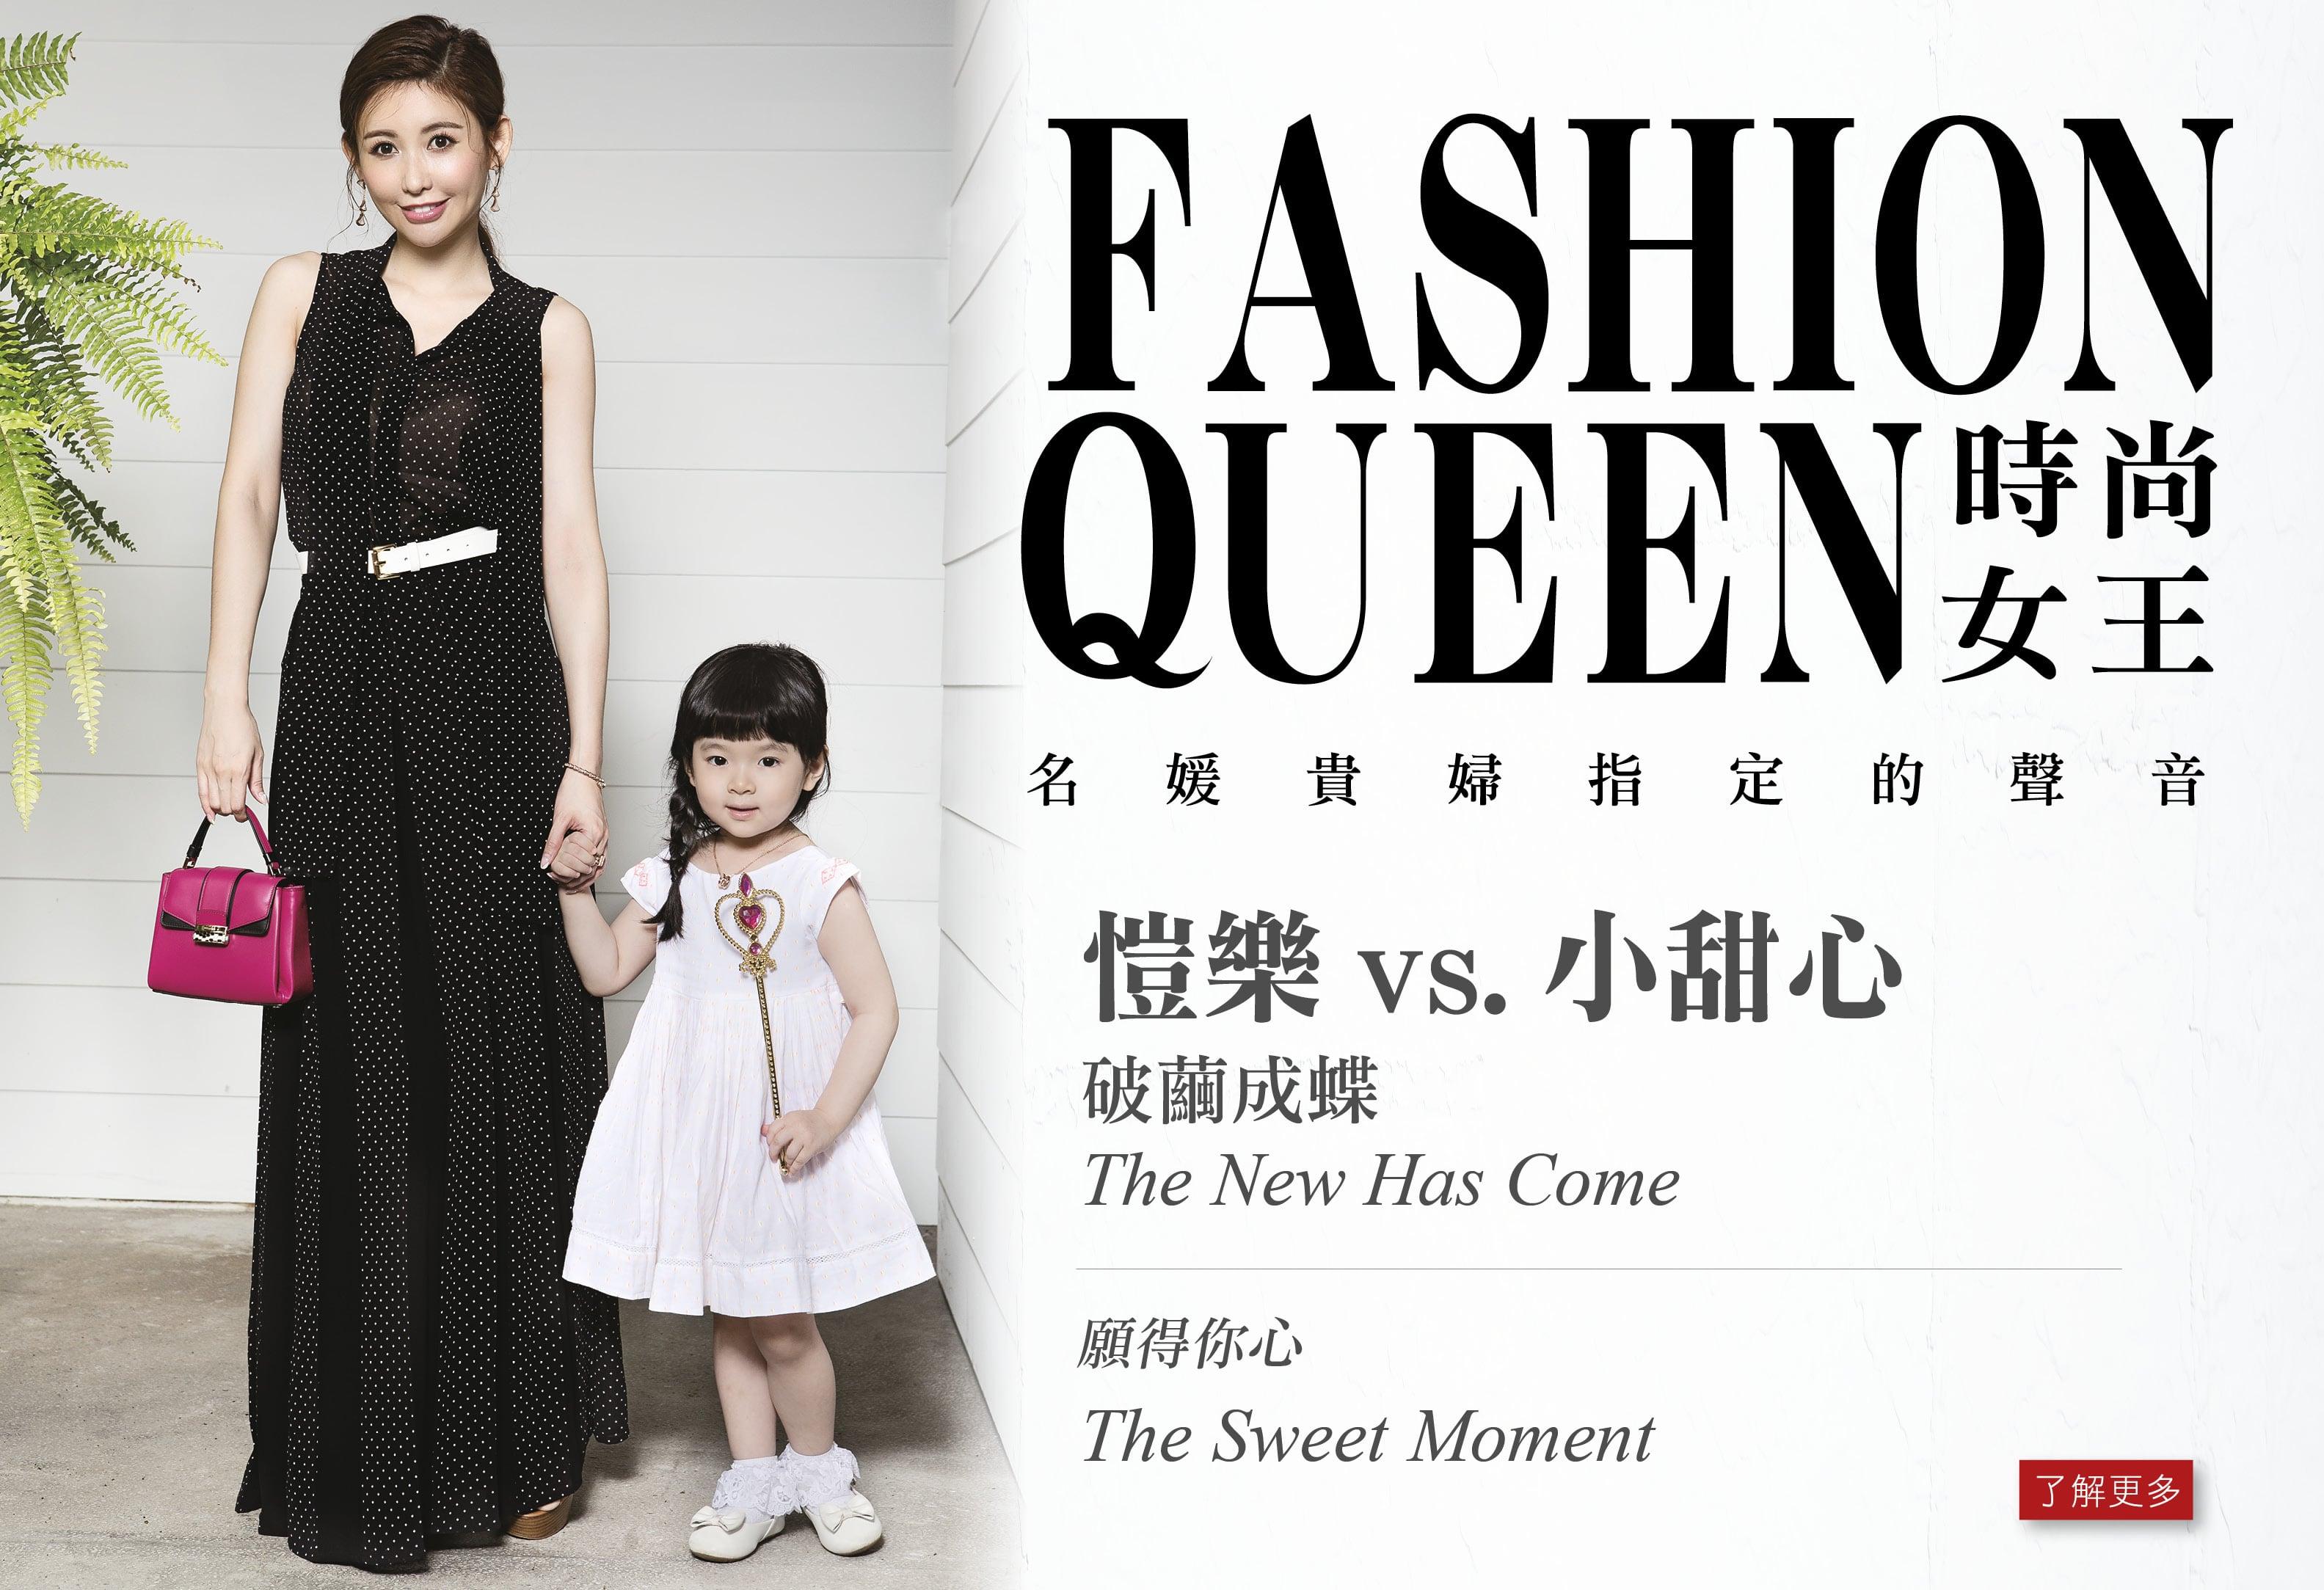 FASHION QUEEN時尚女王雜誌 07月號/2017 第129期